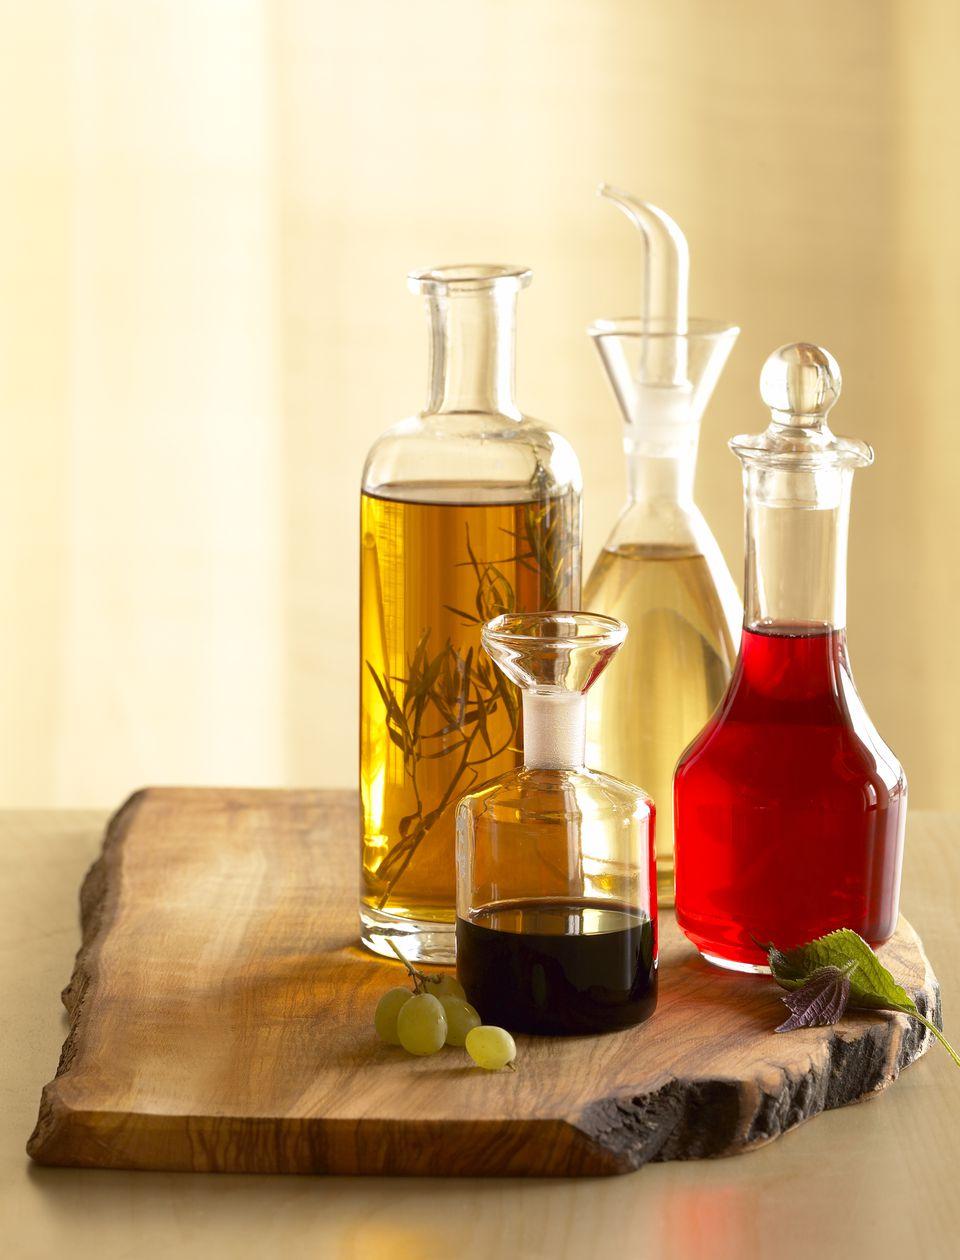 Assorted vinegars